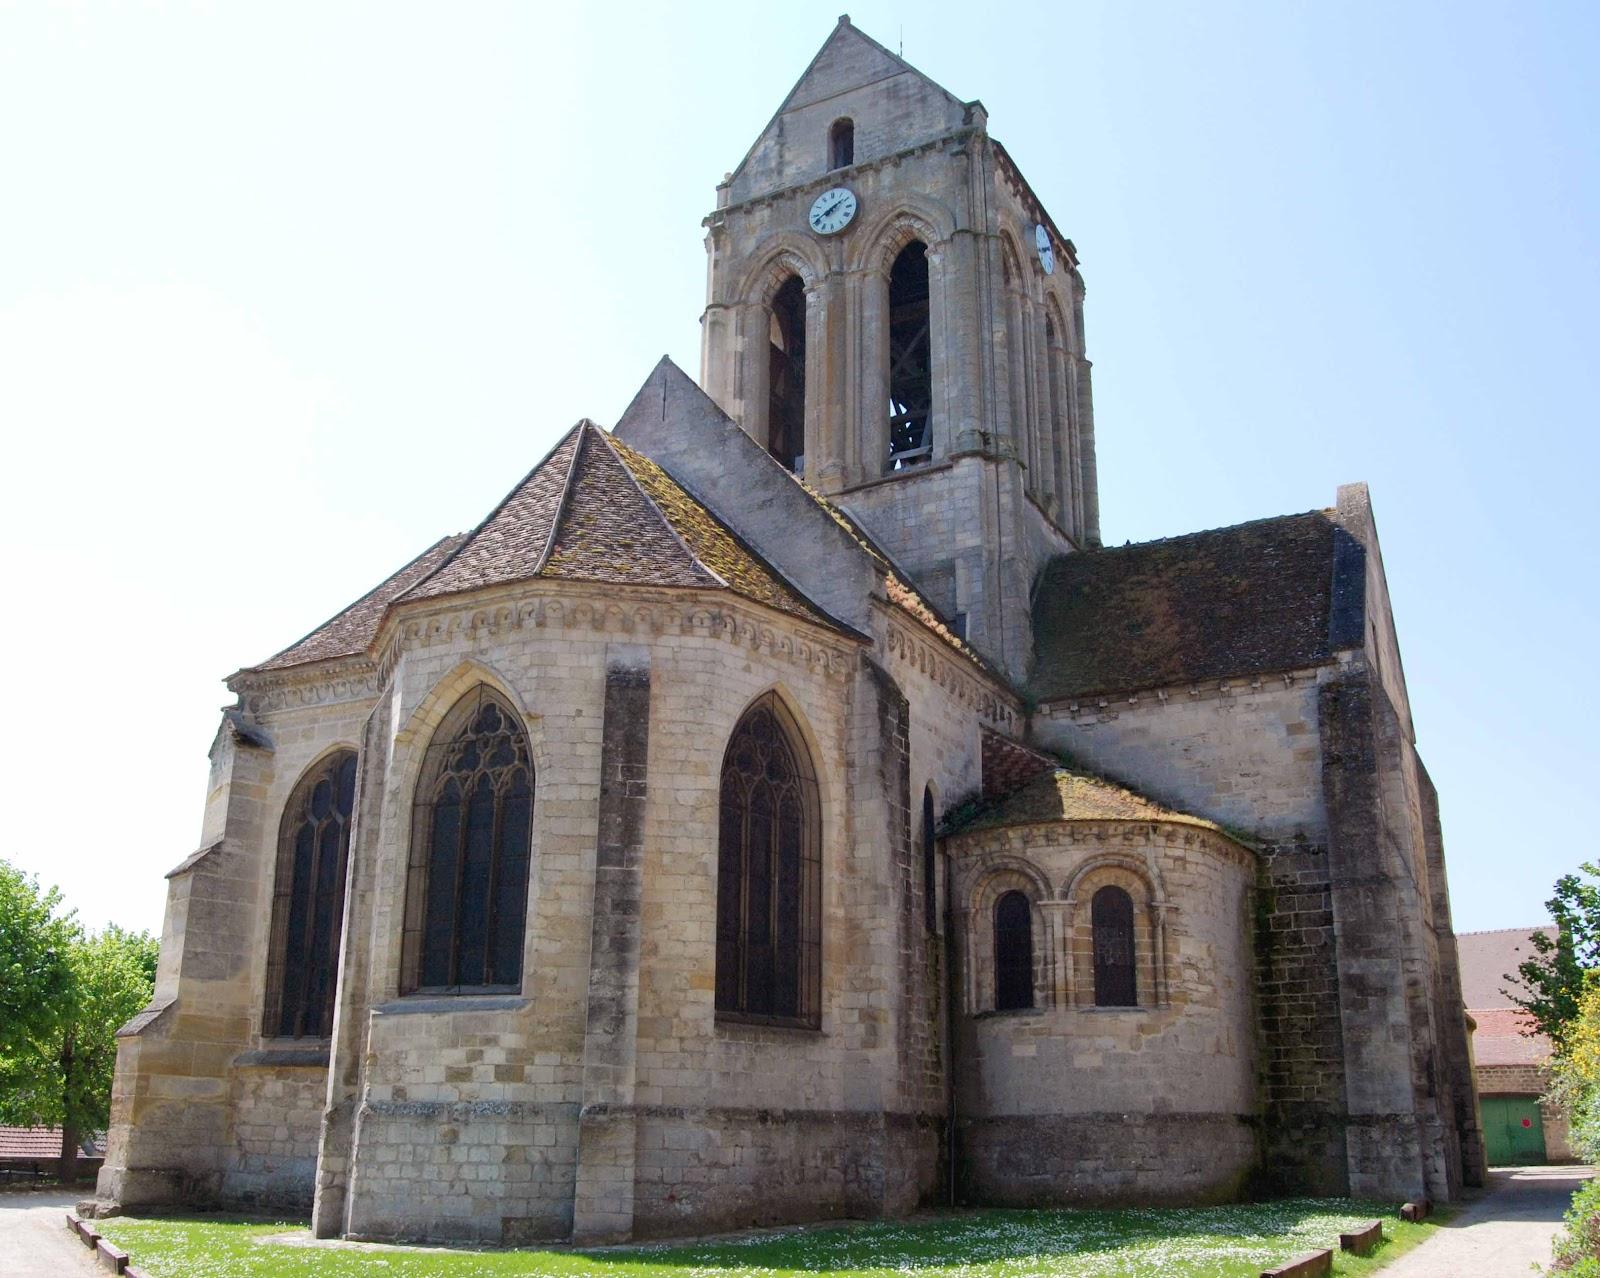 Artwife Needs a Life: Vincent Van Gogh in Auvers-sur-Oise